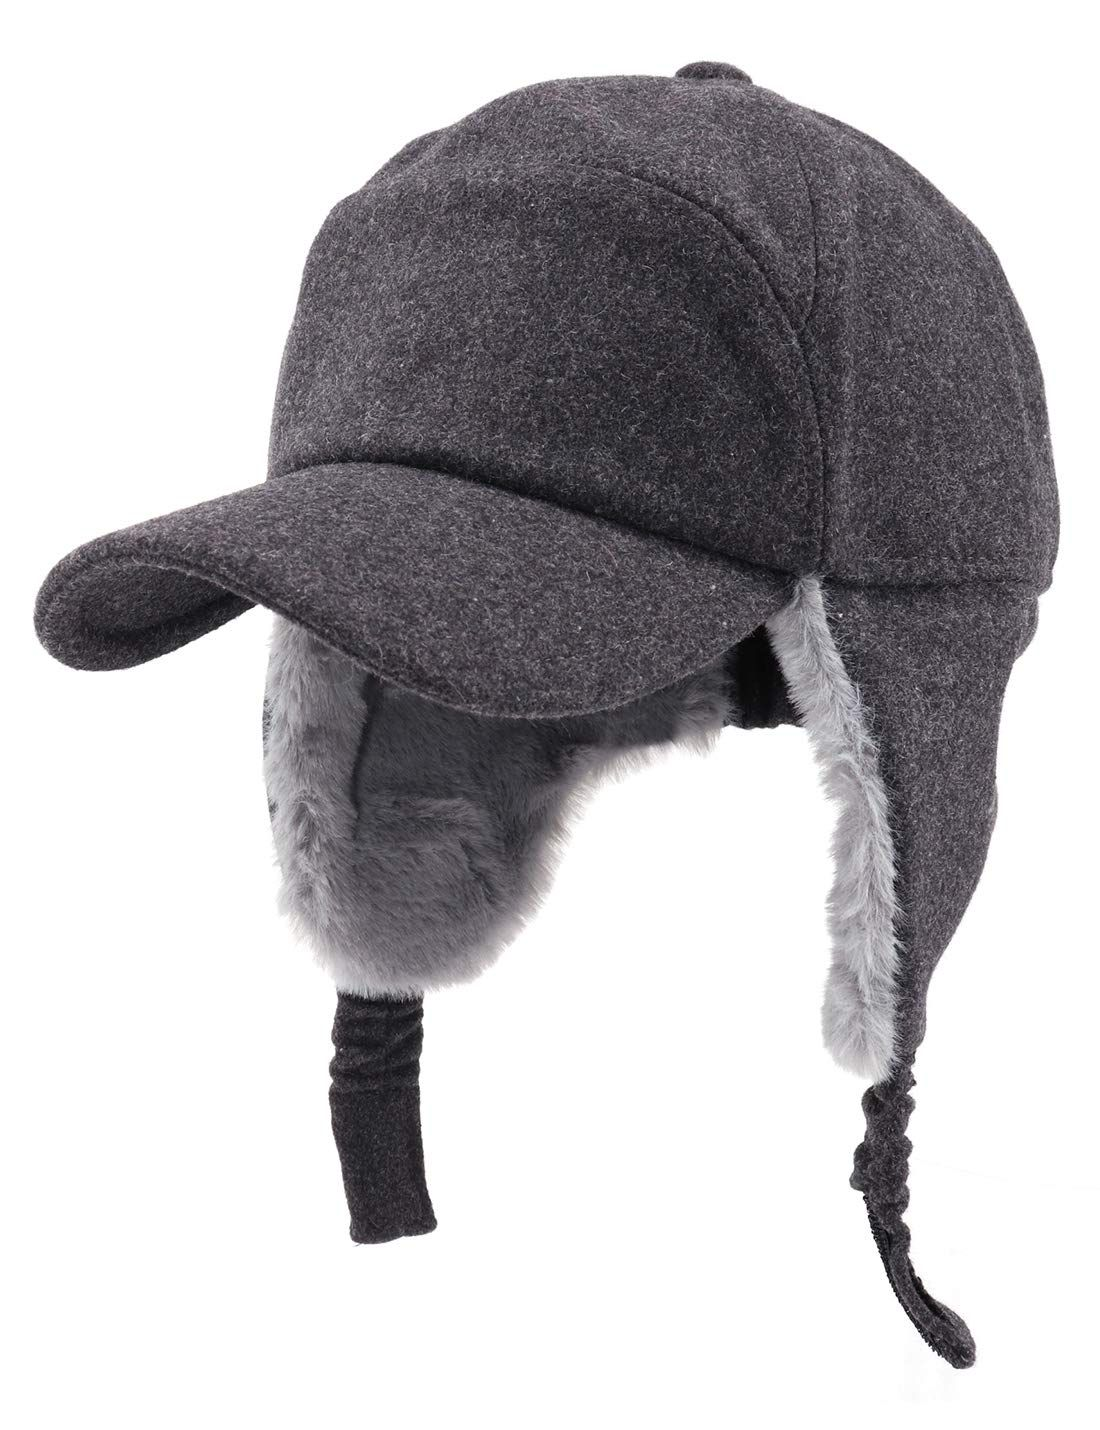 Gisdanchz 7-7 1//2 Wool Baseball Hat with Visor and Ear Flaps Winter Warm Cap for Men Women